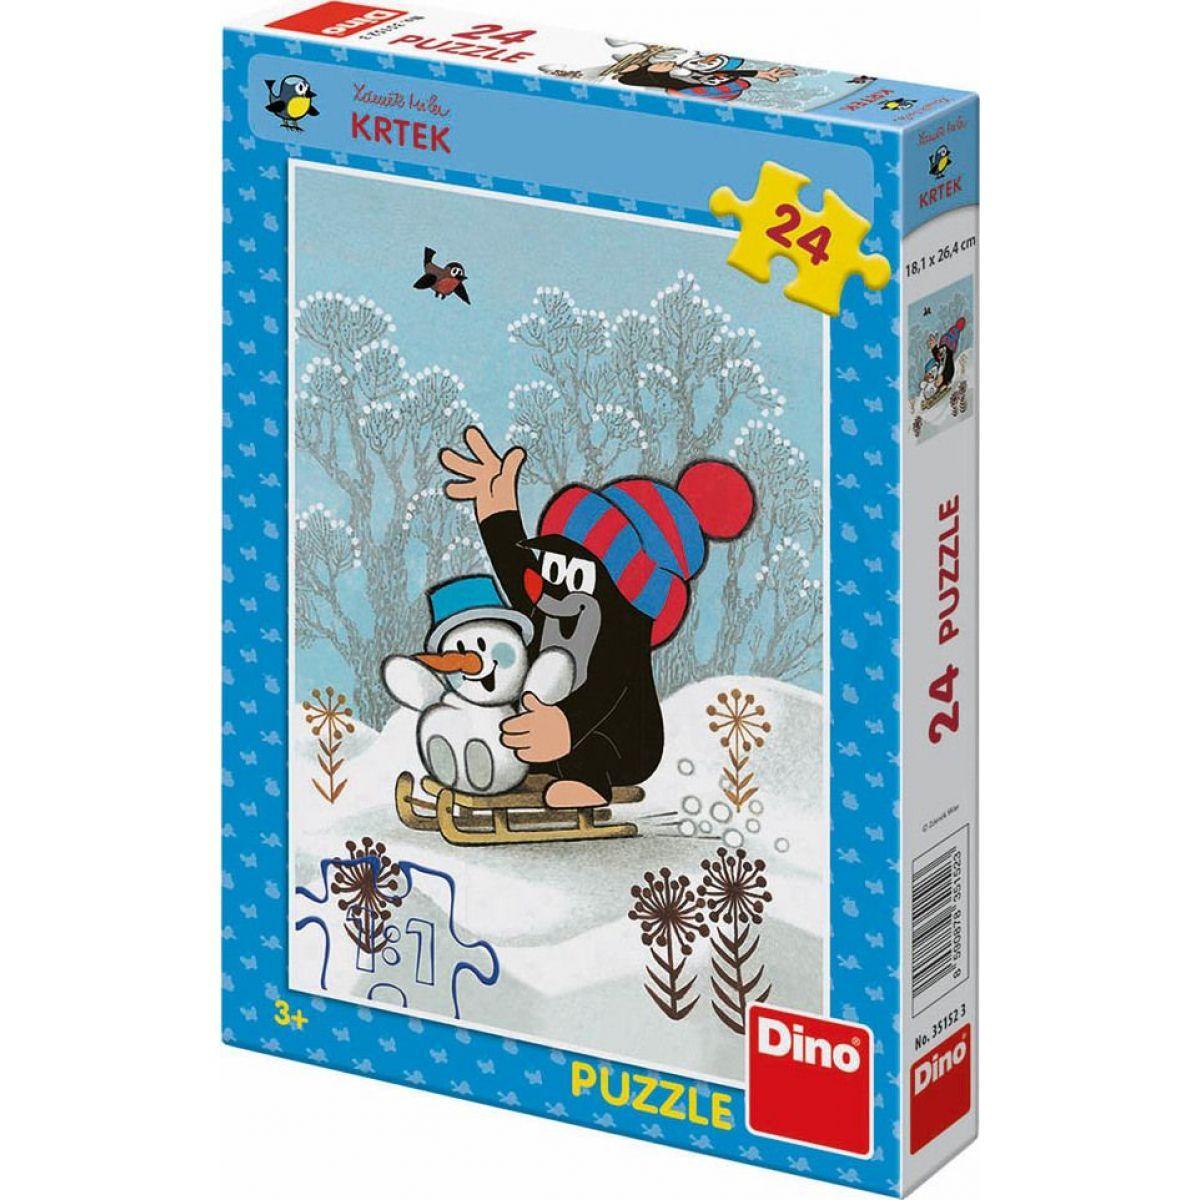 Dino Puzzle Krtek a Sněhulák 24 dílků